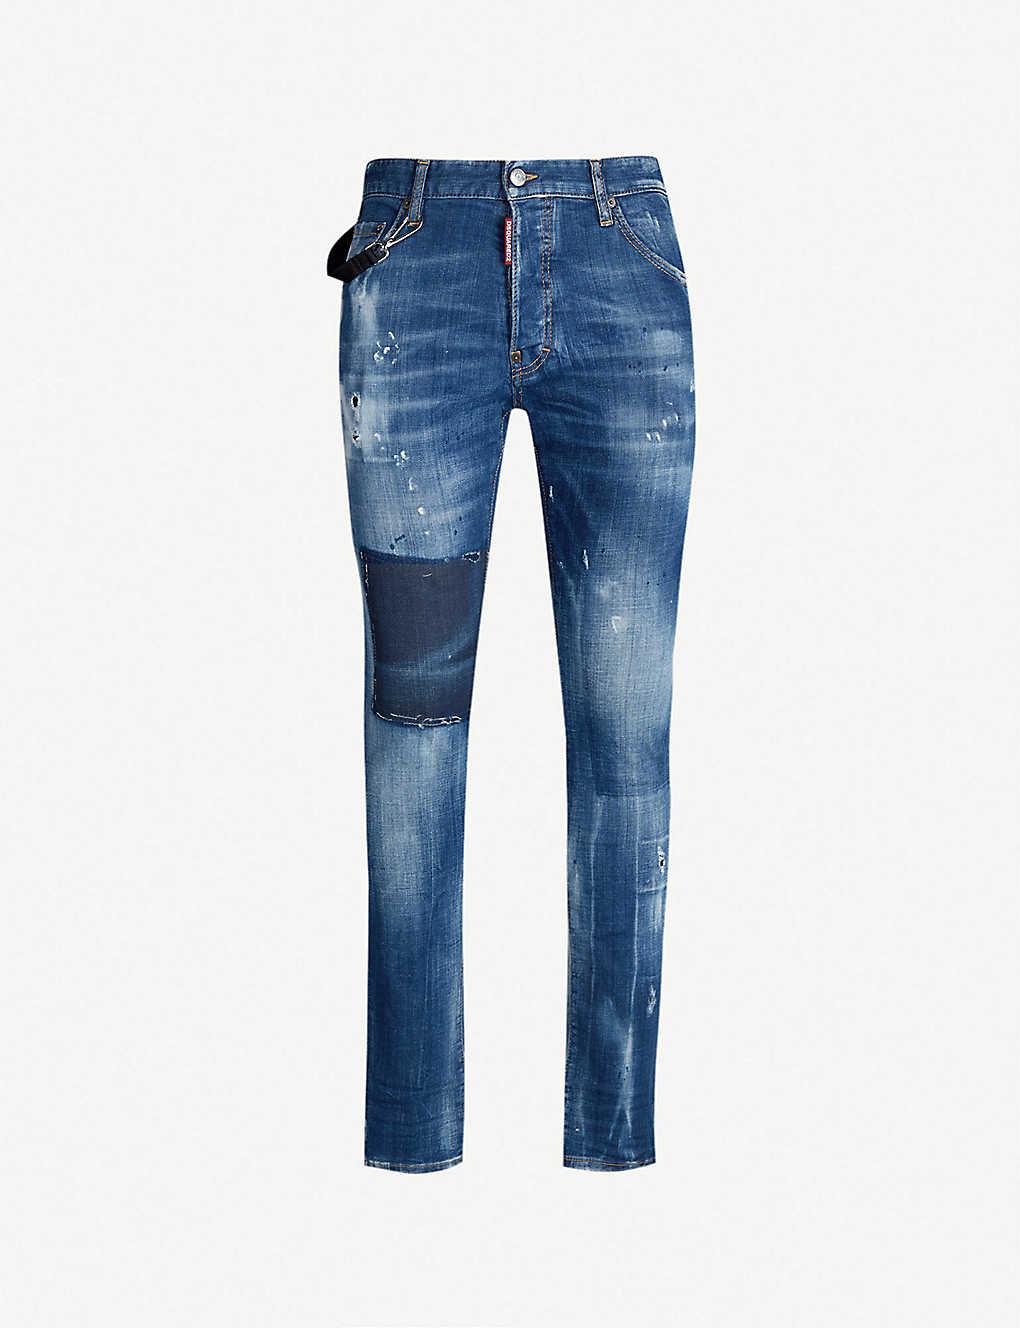 b40d072701 Cool Guy distressed slim-fit skinny jeans - Dark vicious blue ...